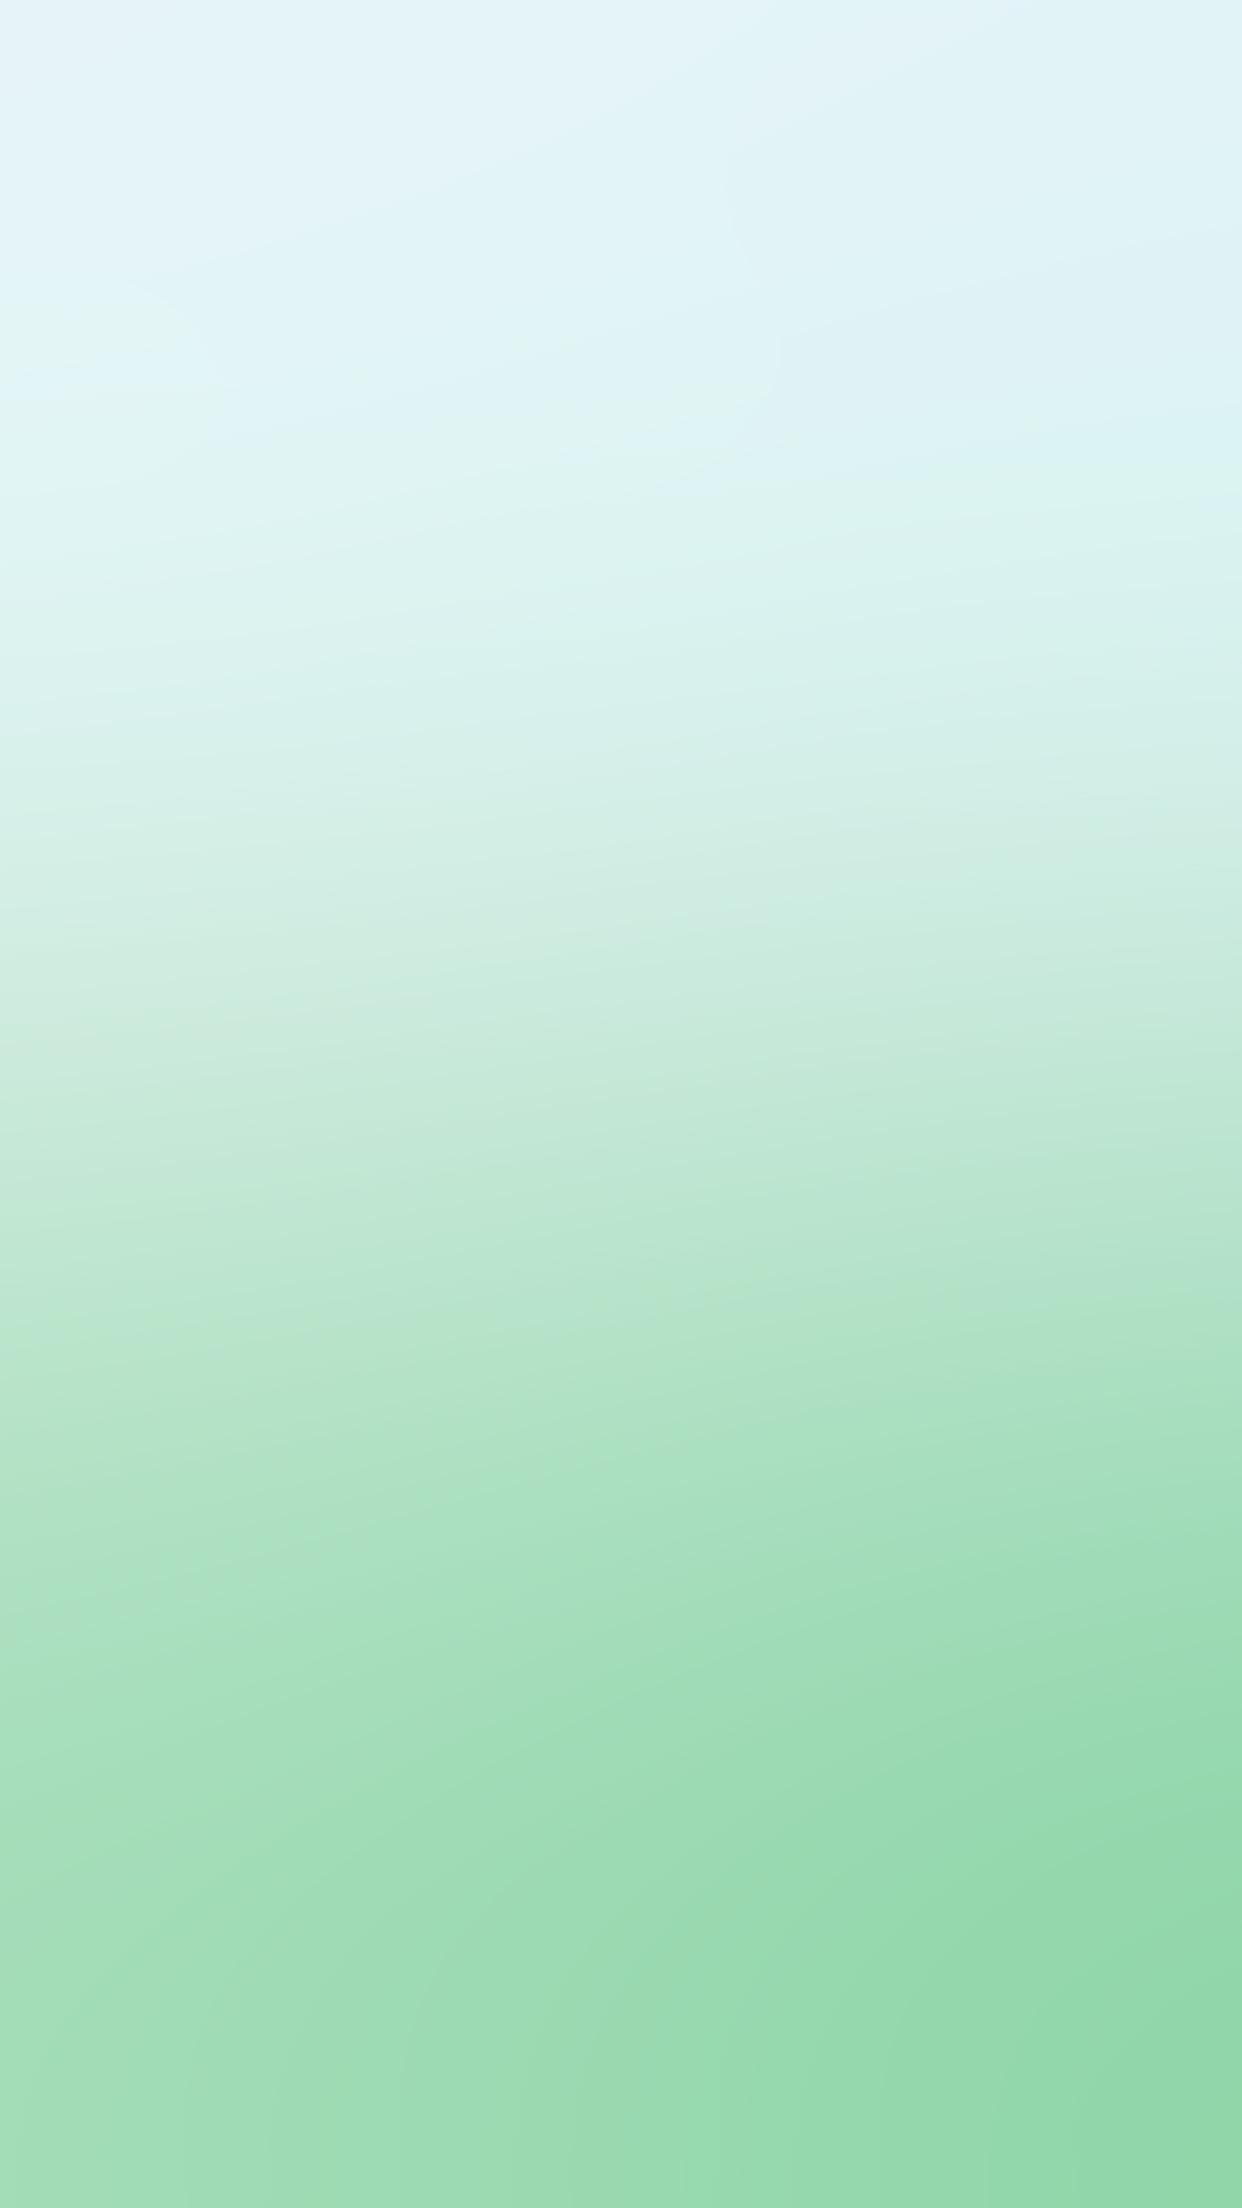 Iphone7paperscom Iphone7 Wallpaper Sm93 Green Soft